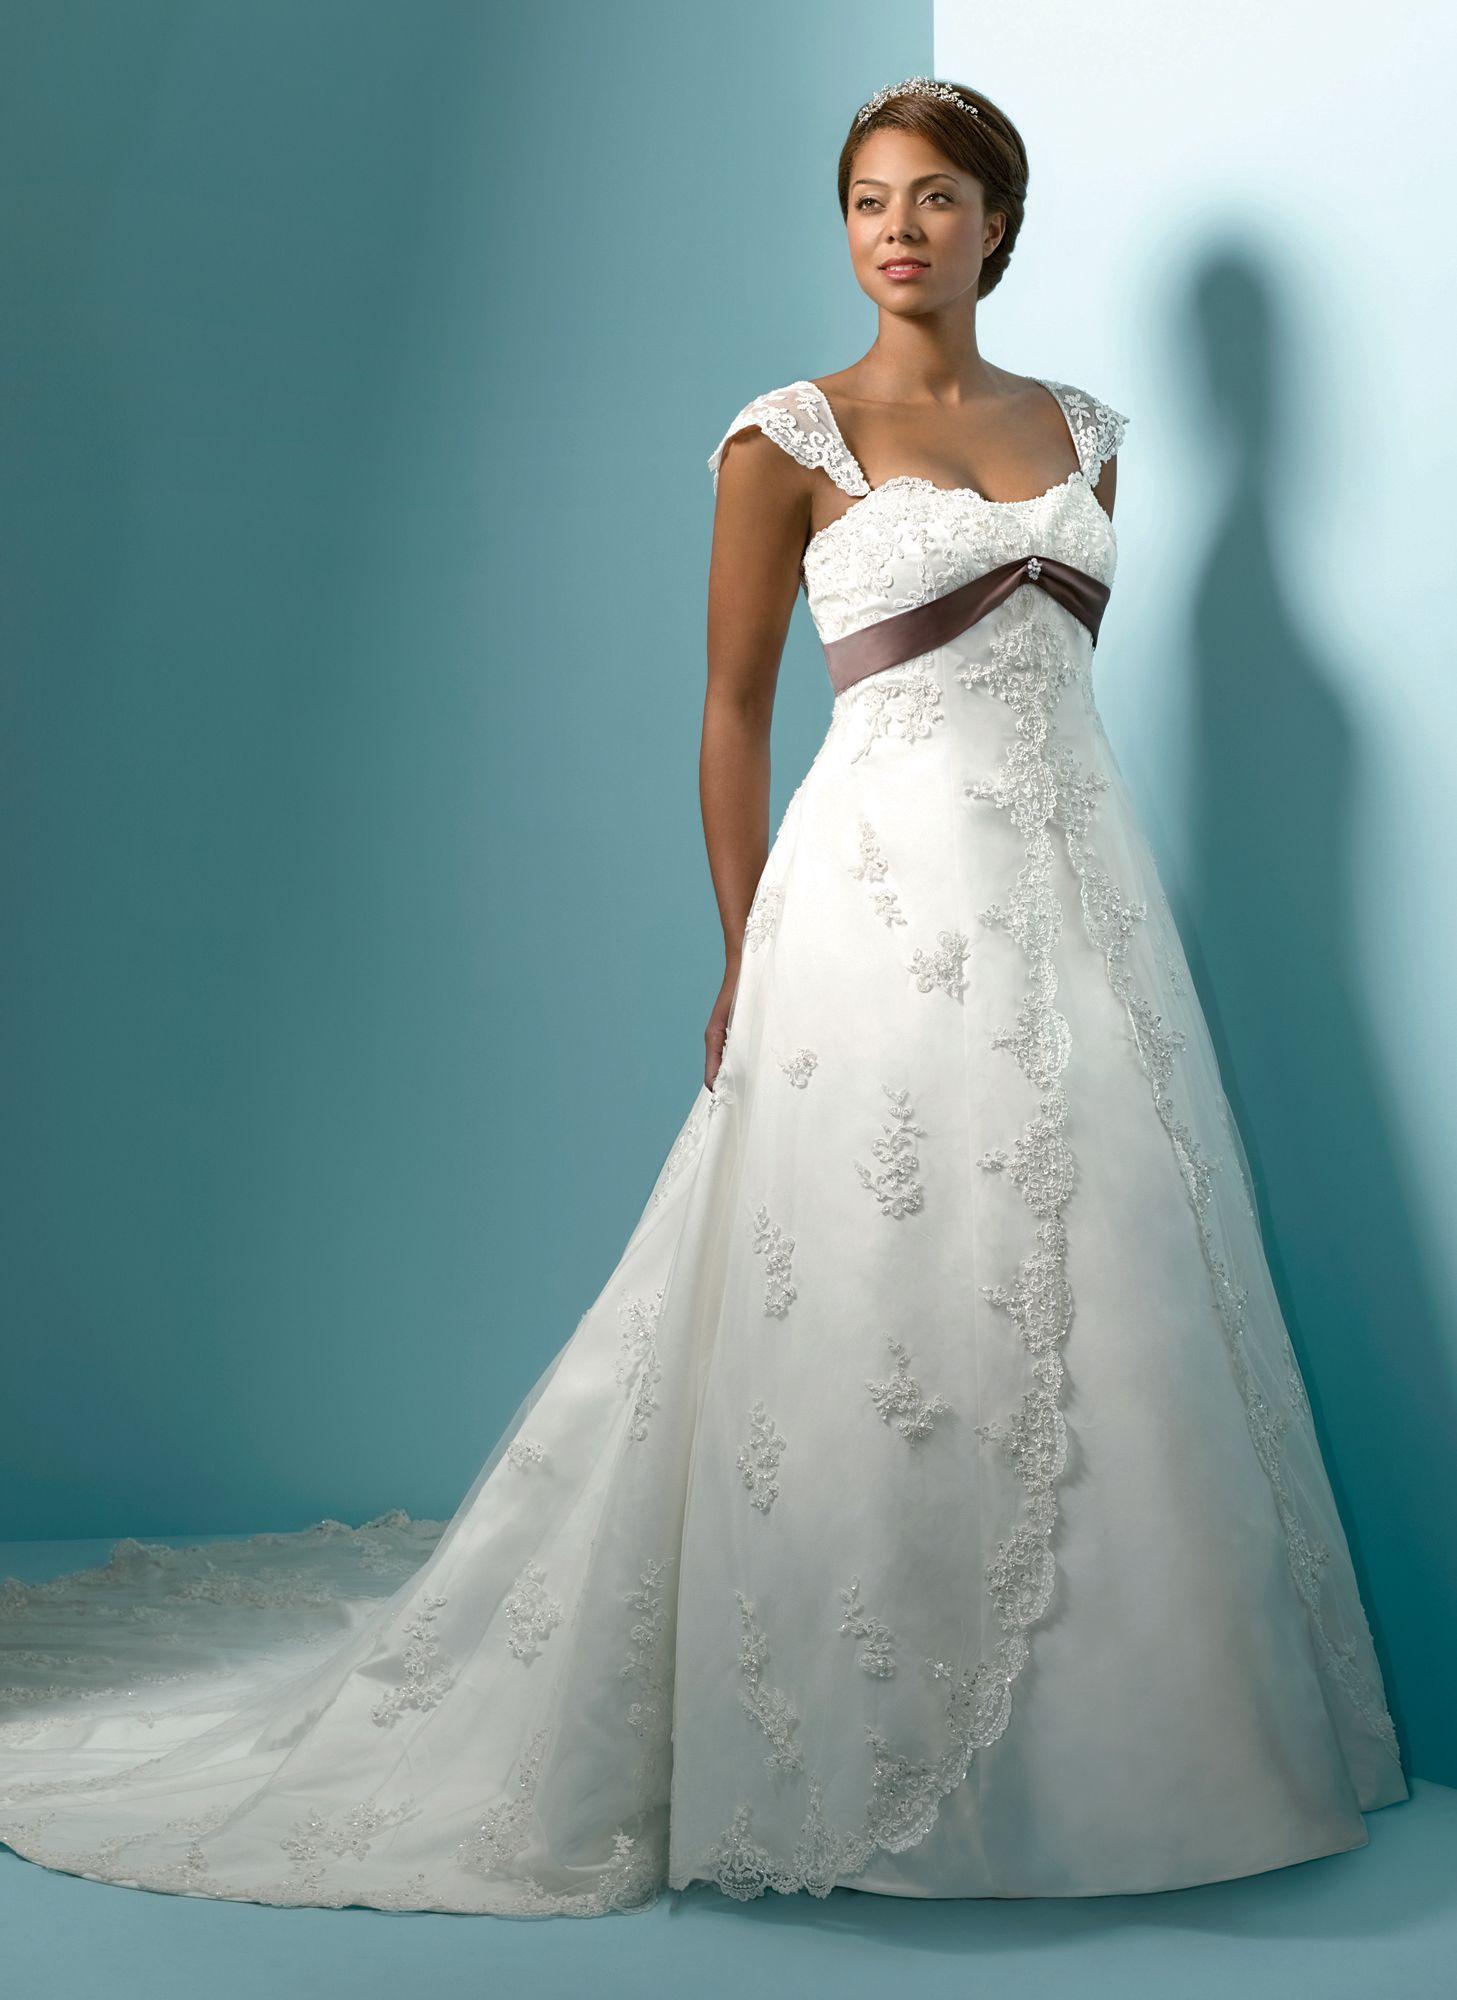 Angelo plus size wedding dress angelo plus size wedding dresses angelo plus size wedding dress angelo plus size wedding dresses style 1719w weddings ombrellifo Image collections